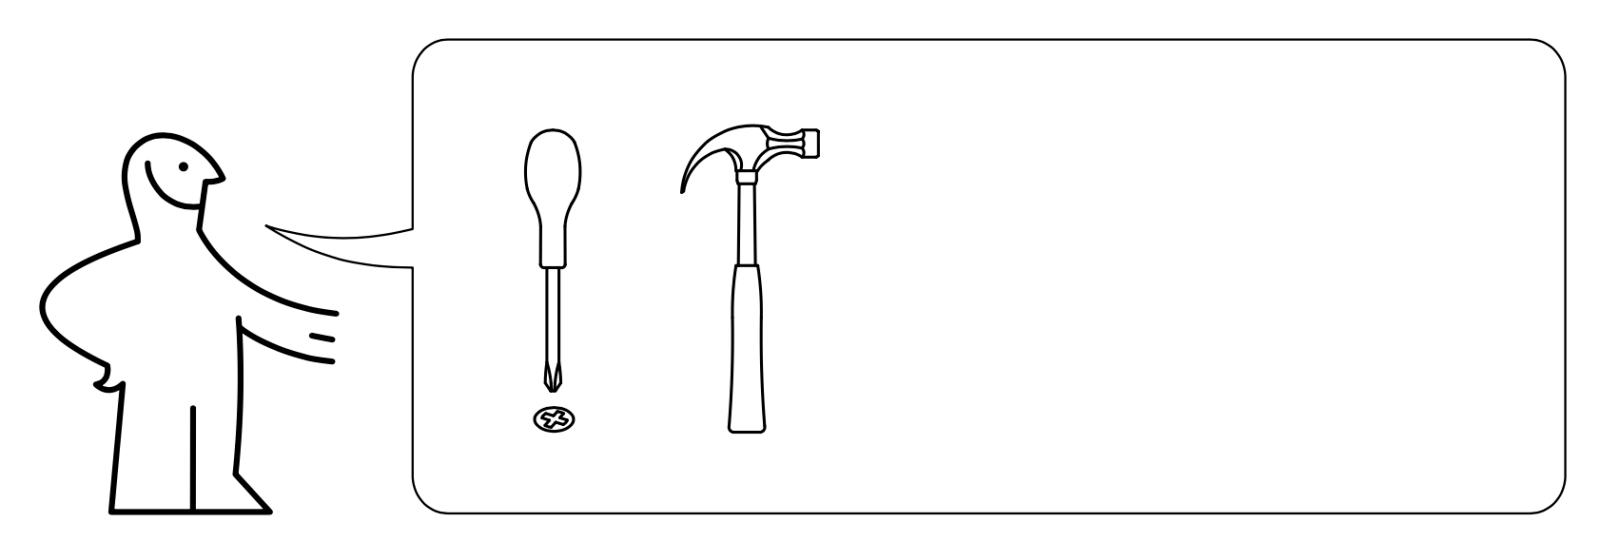 IKEA screwdriver